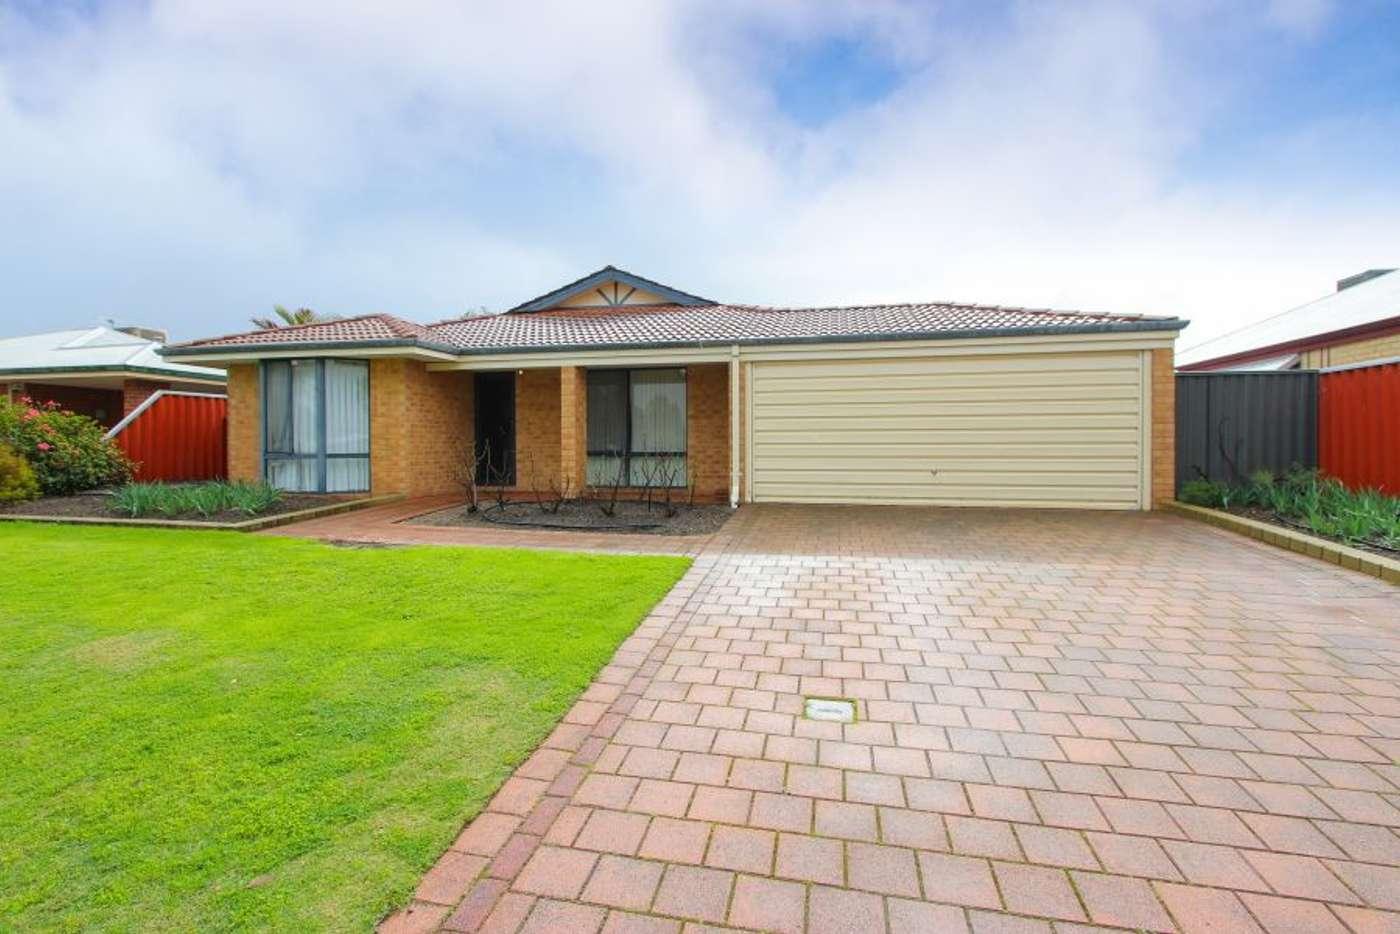 Main view of Homely house listing, 43 Coonawarra Drive, Caversham WA 6055